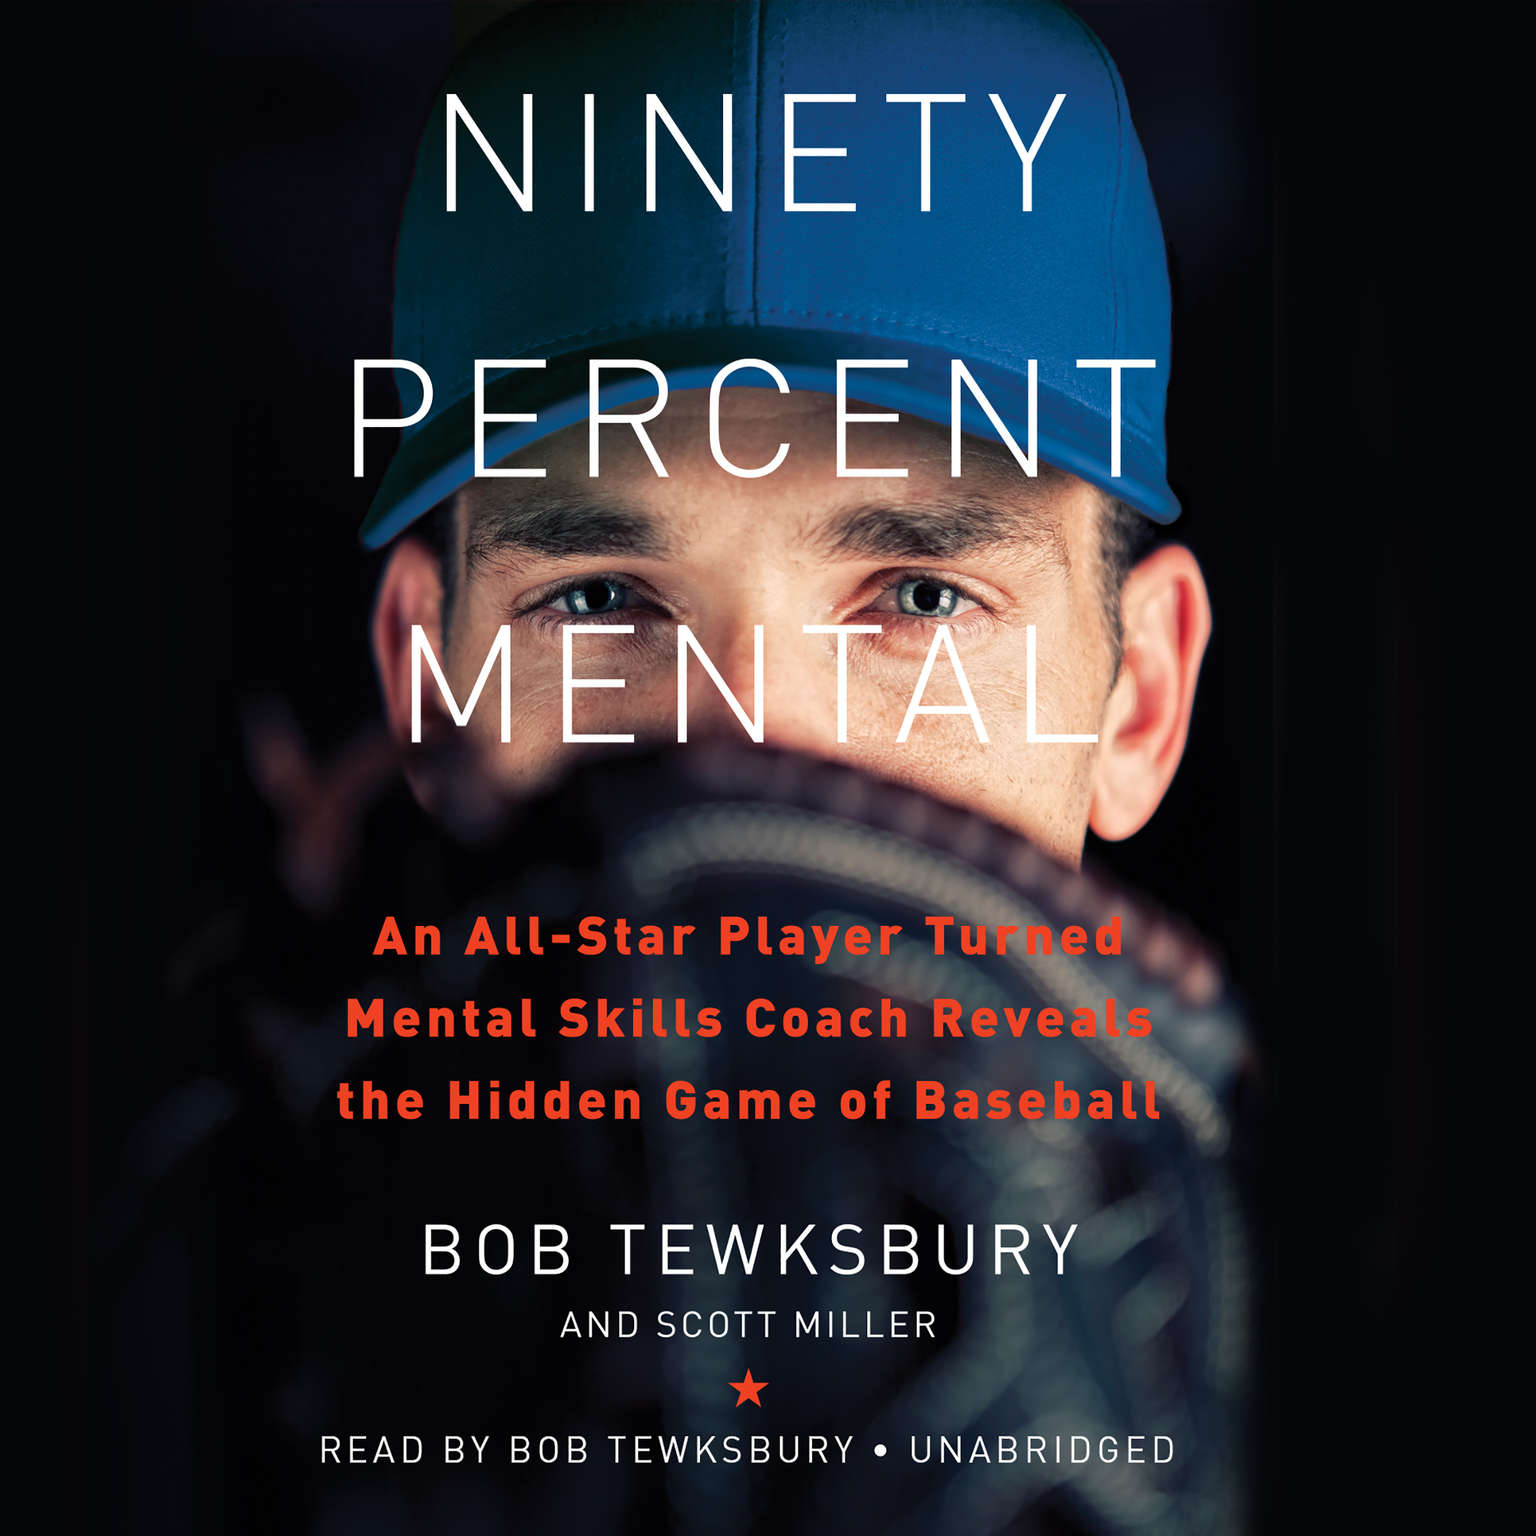 Ninety Percent Mental: An All-Star Player Turned Mental Skills Coach Reveals the Hidden Game of Baseball Audiobook, by Bob Tewksbury